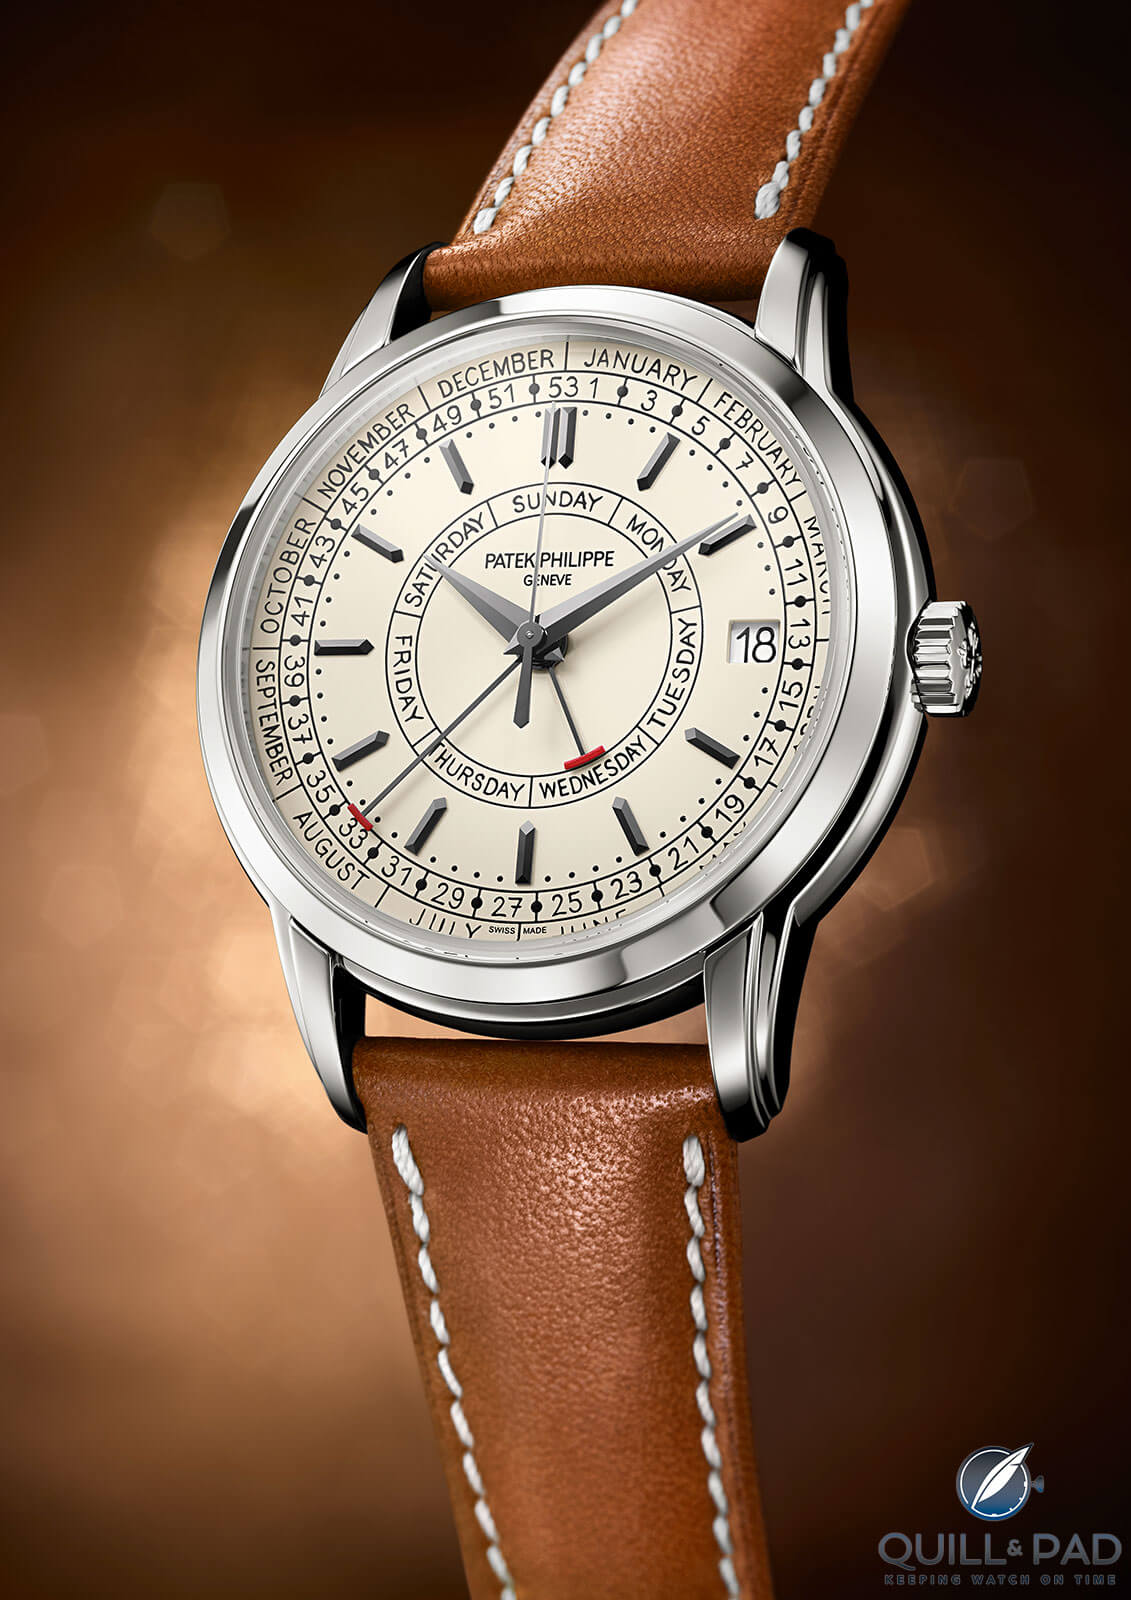 Patek Philippe 5212A Calatrava Weekly Calendar: Patek's First Production Steel Dress Watch In Decades